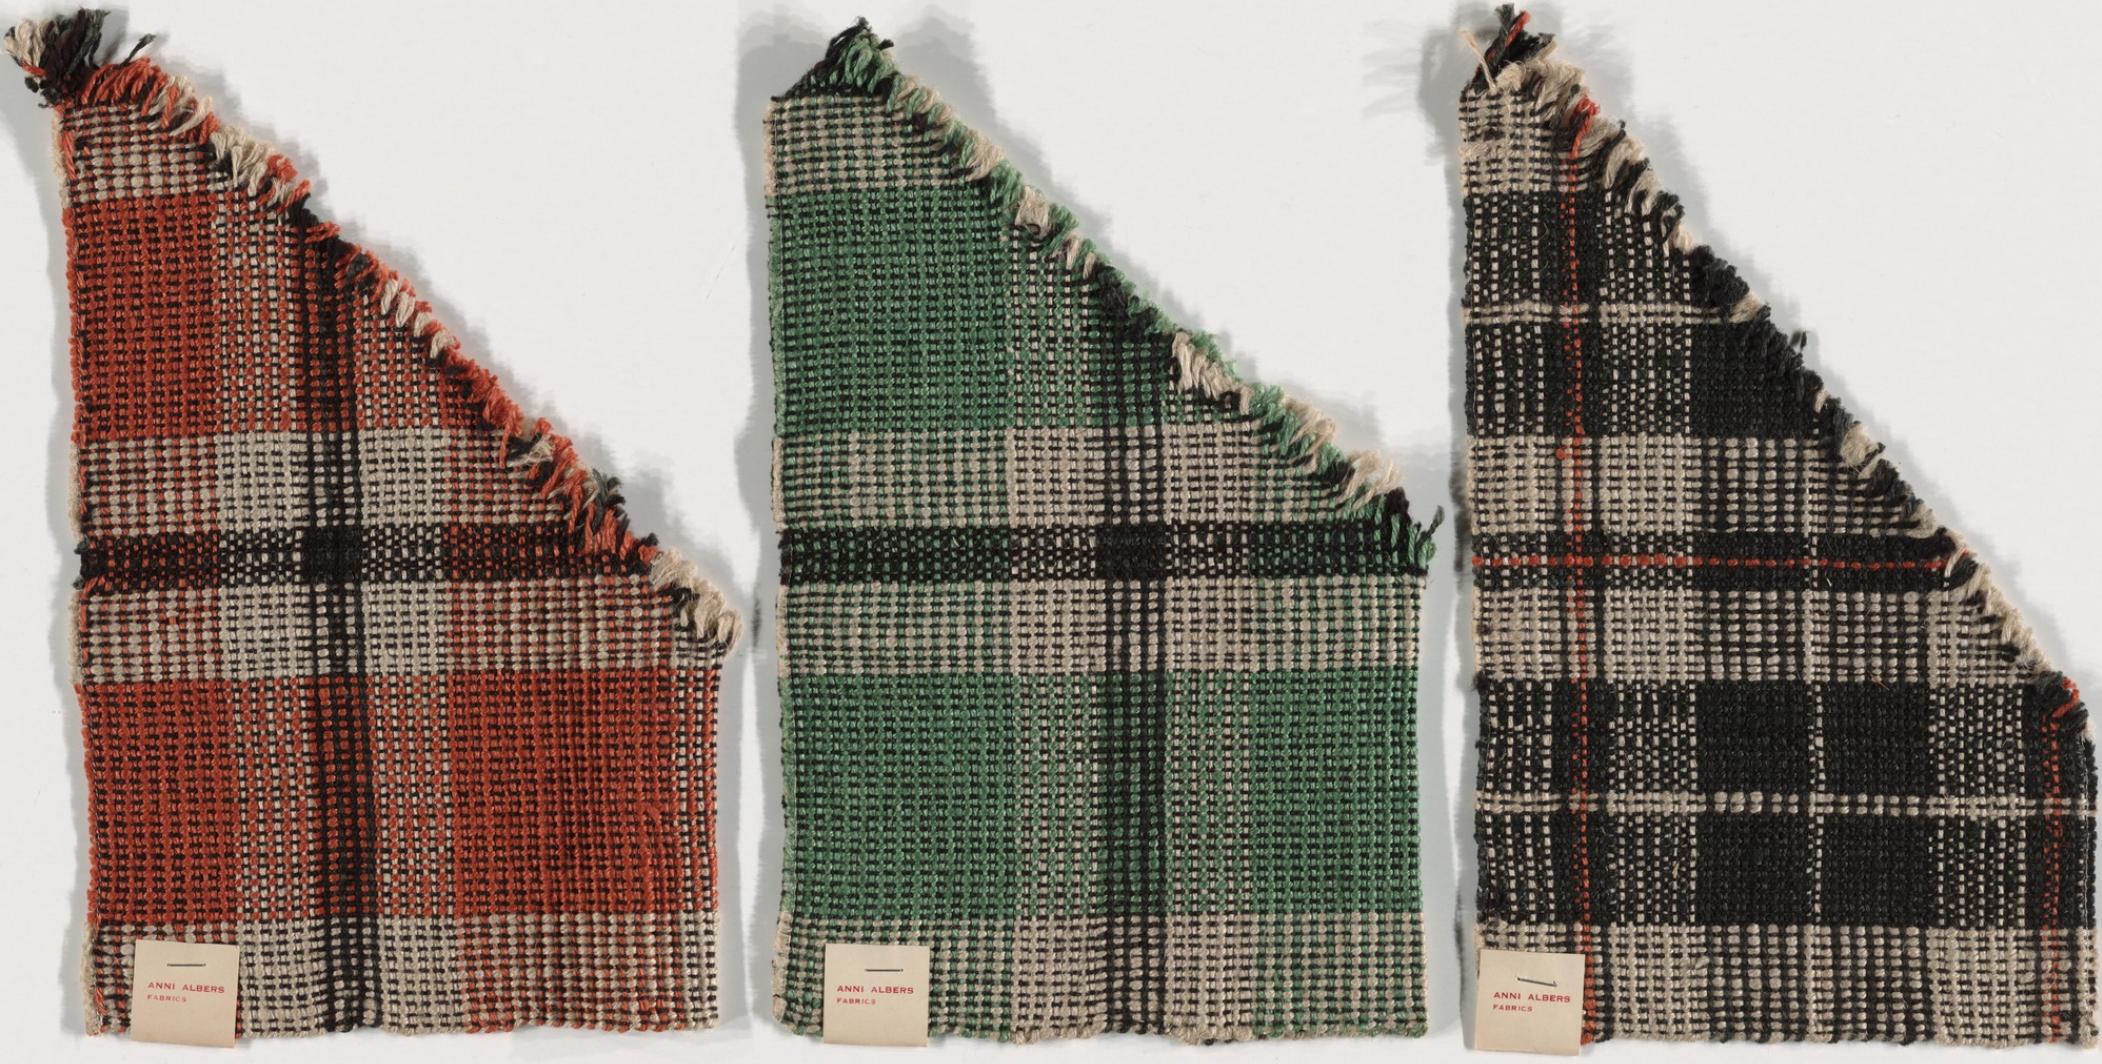 Anni Albers. Bedspread Material for Harvard Graduate Center Dormitory. 1949